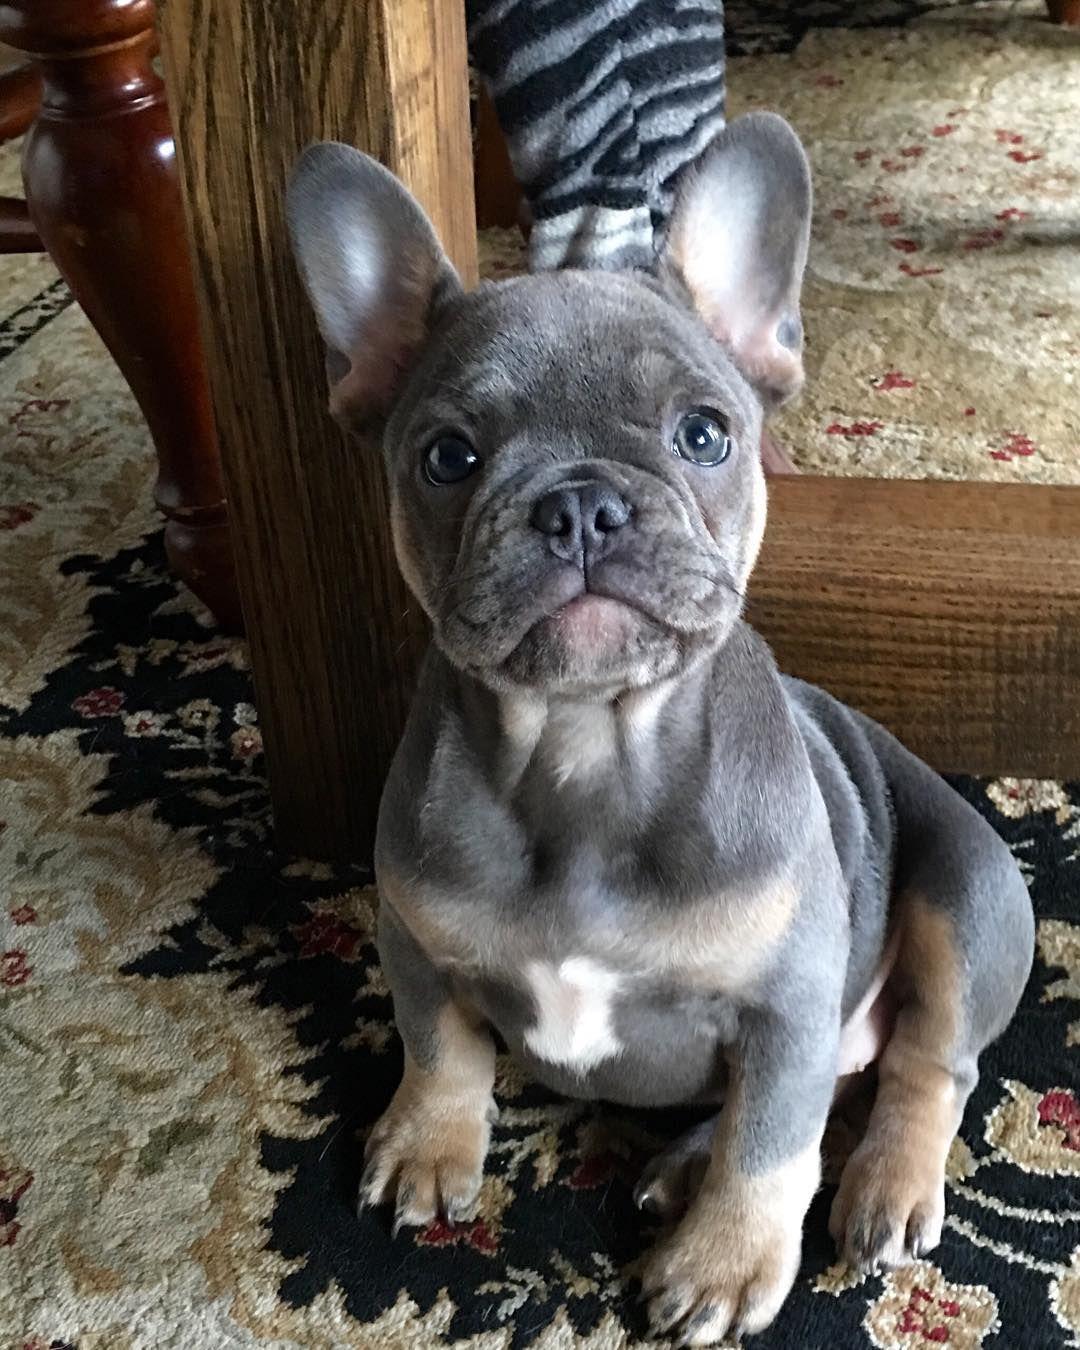 Pin By Shawnna Arns On Animals Bulldog Puppies Baby Animals